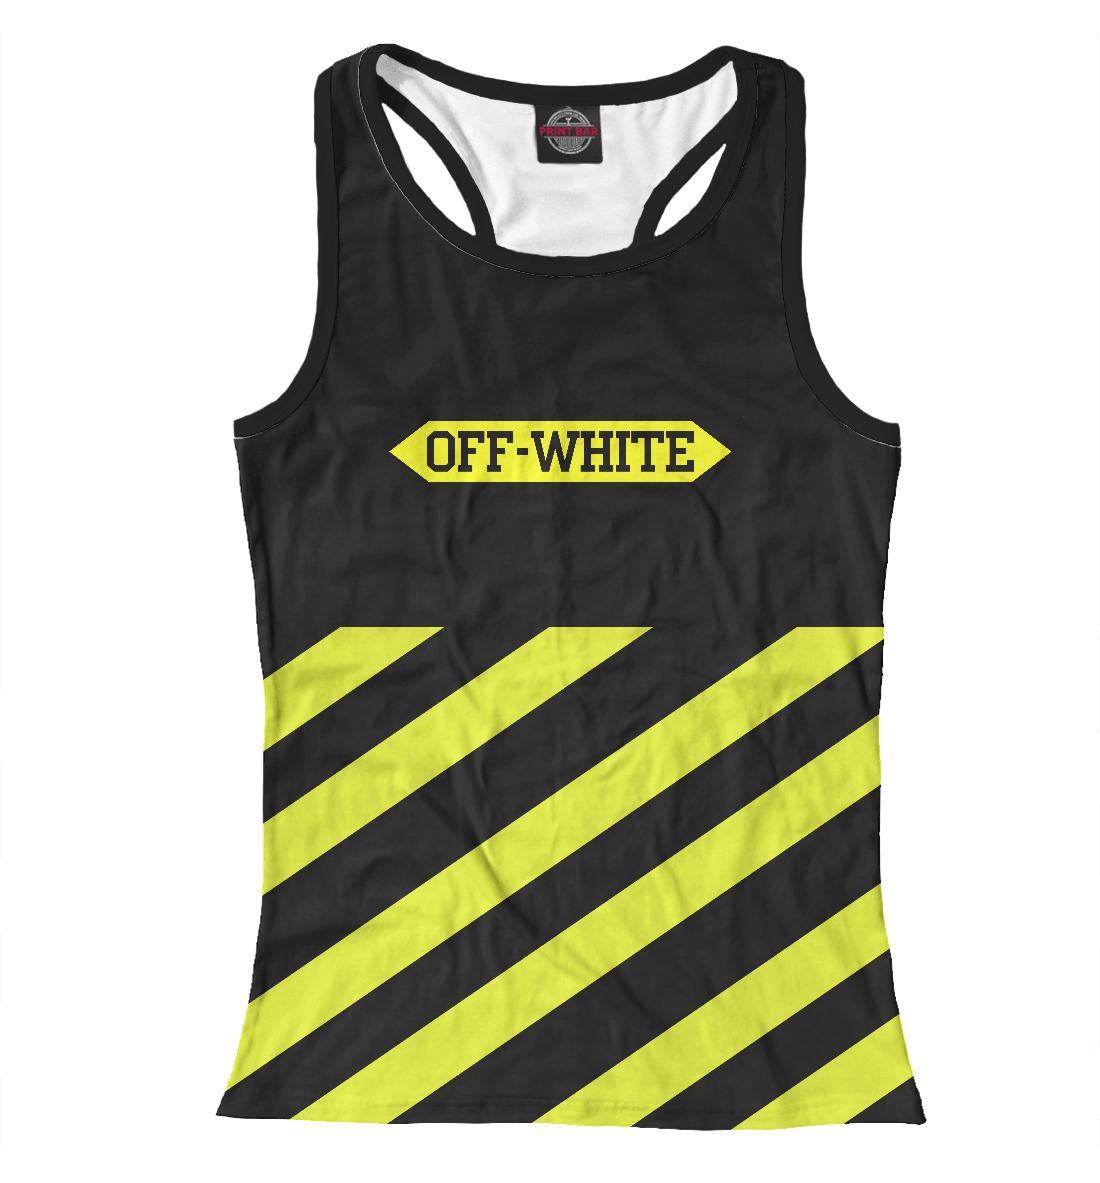 Купить Off-White, Printbar, Майки борцовки, APD-768732-mayb-1